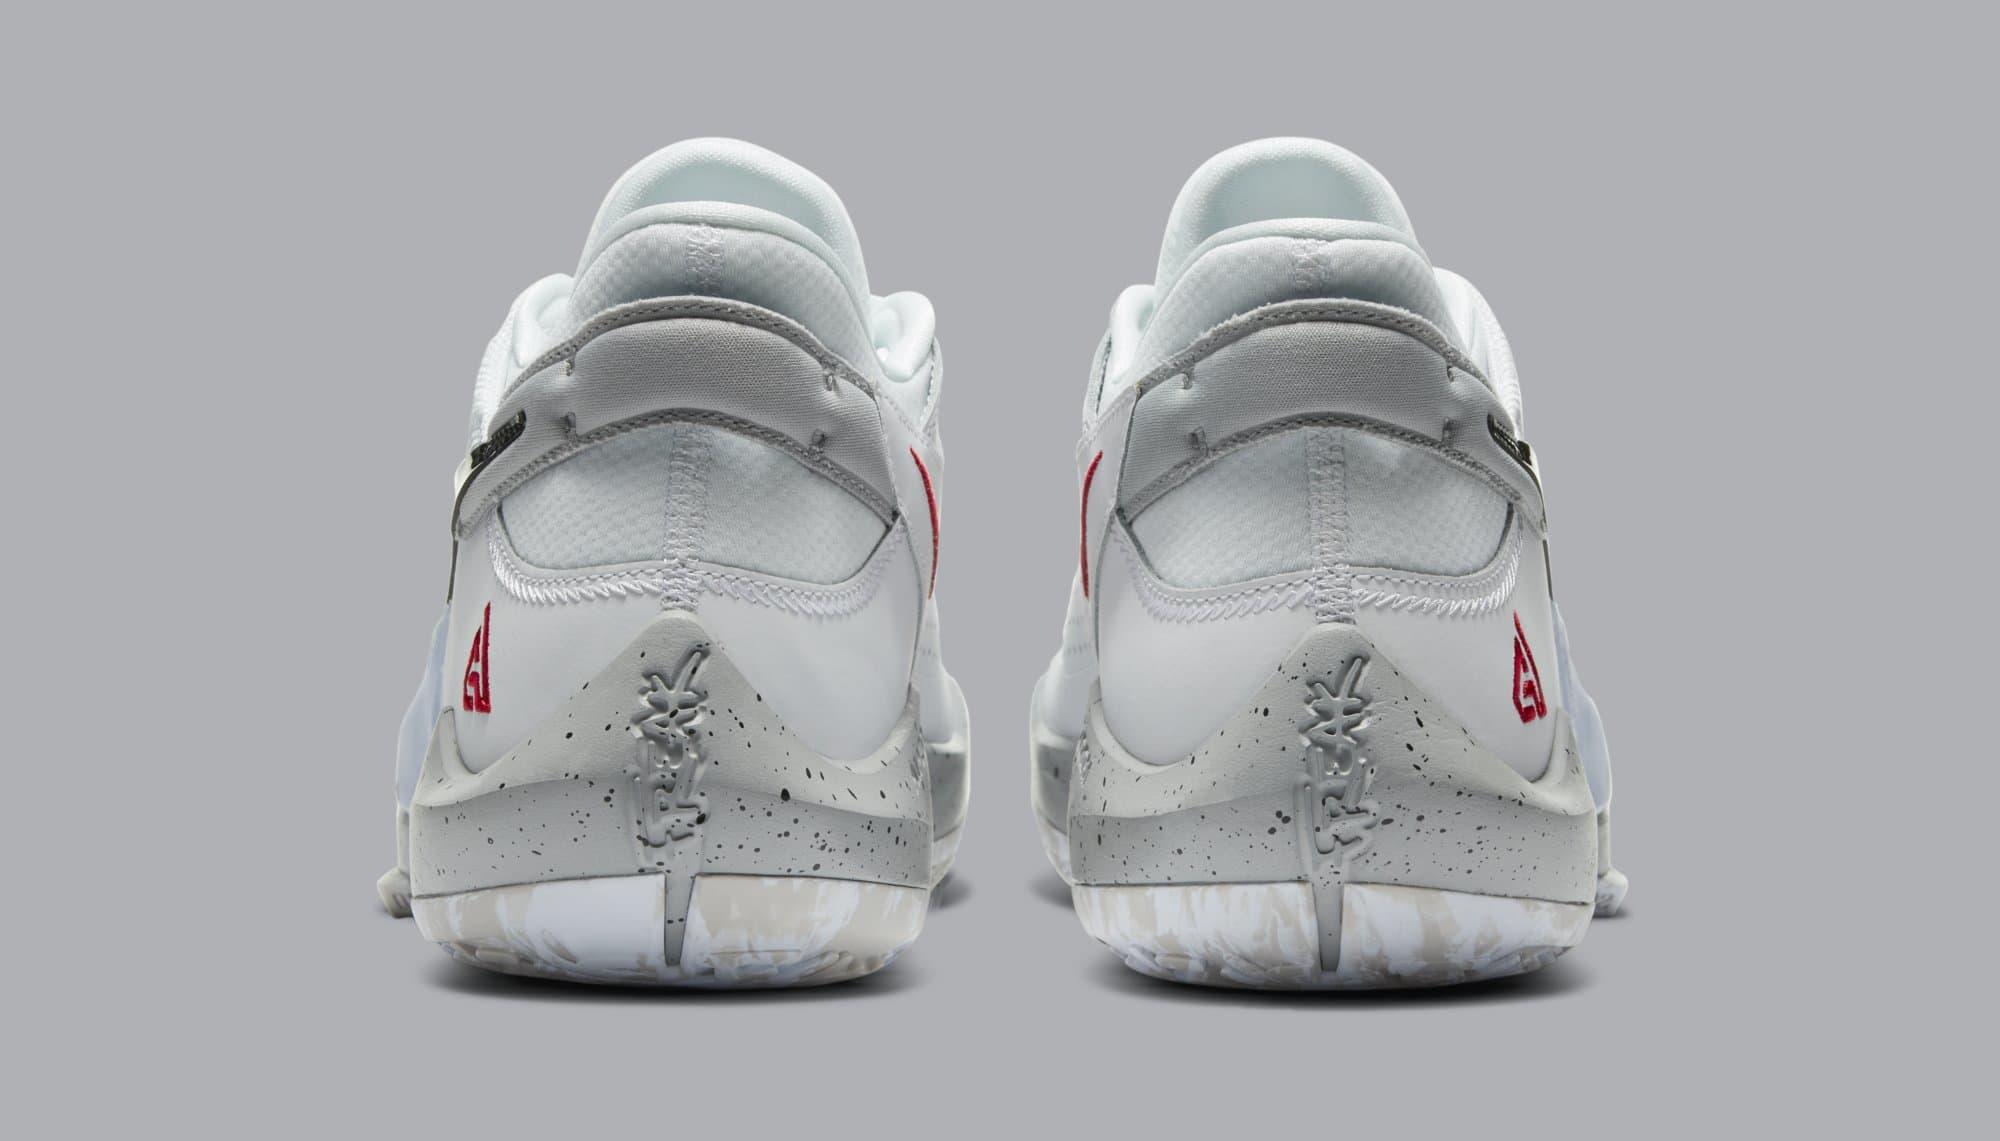 Nike Air Zoom Freak 2 'White/Cement' CK5825-100 (Heel)